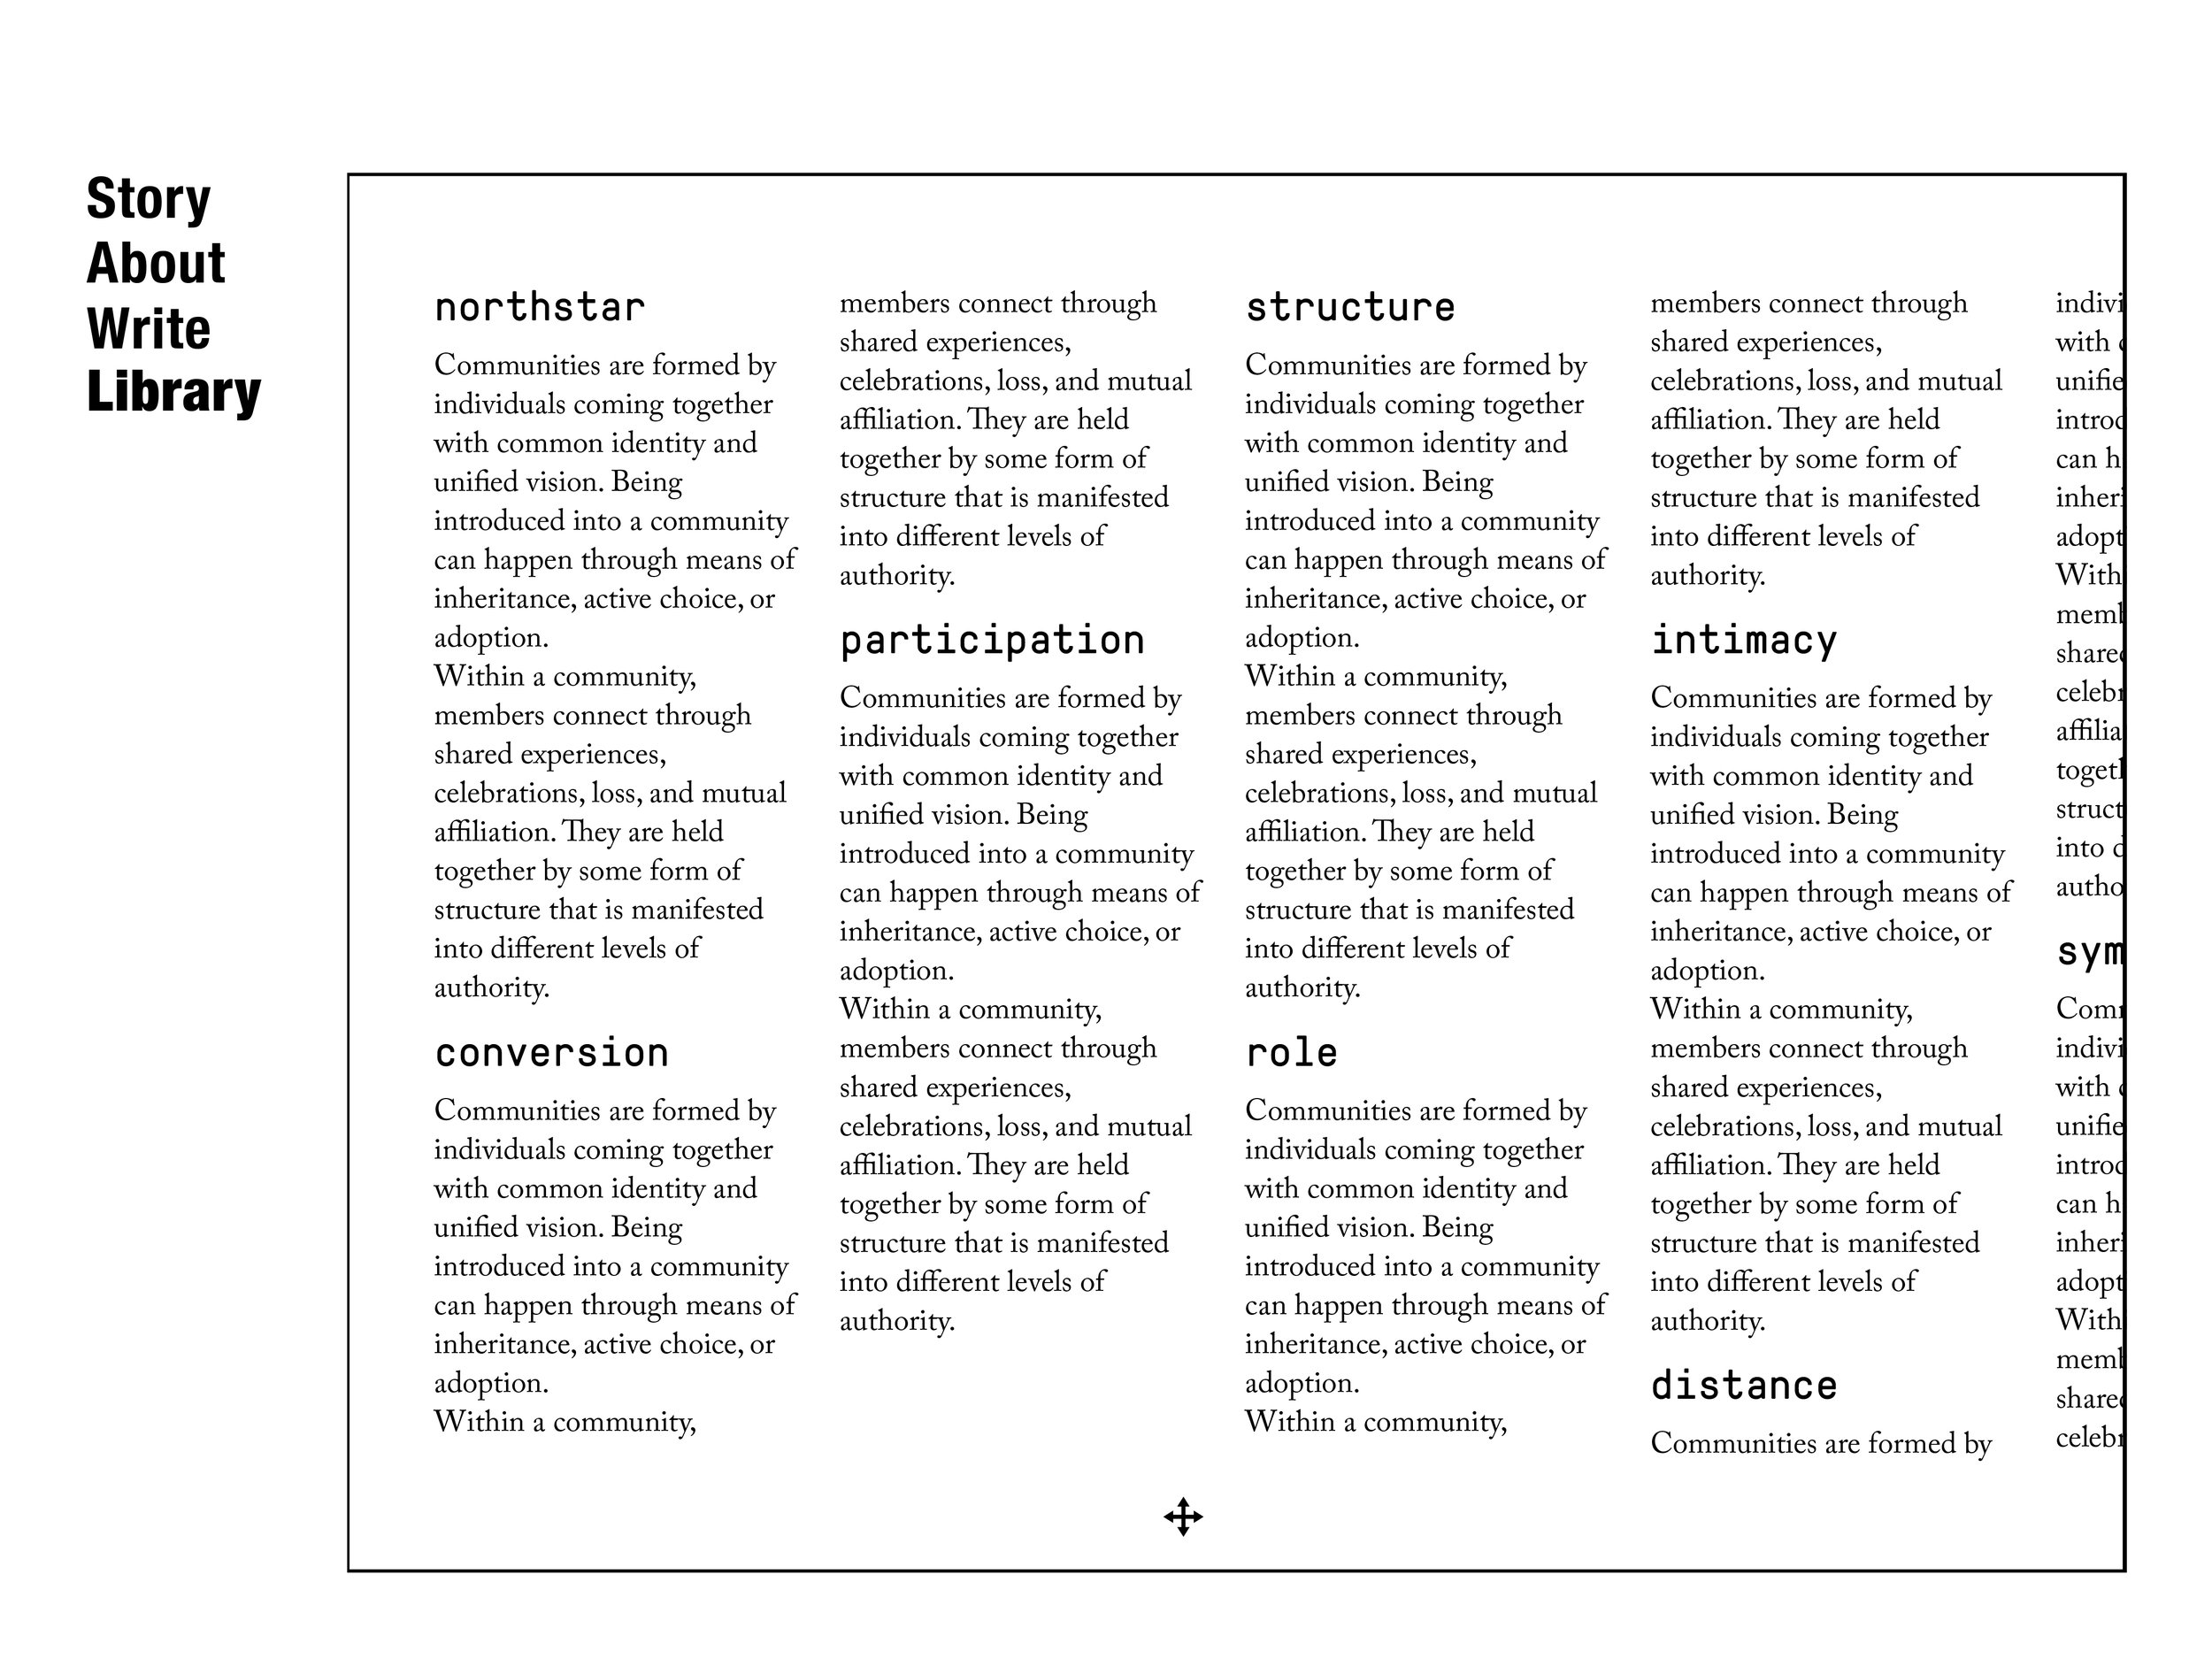 FinalScreens_CommunityStructure-18.jpg